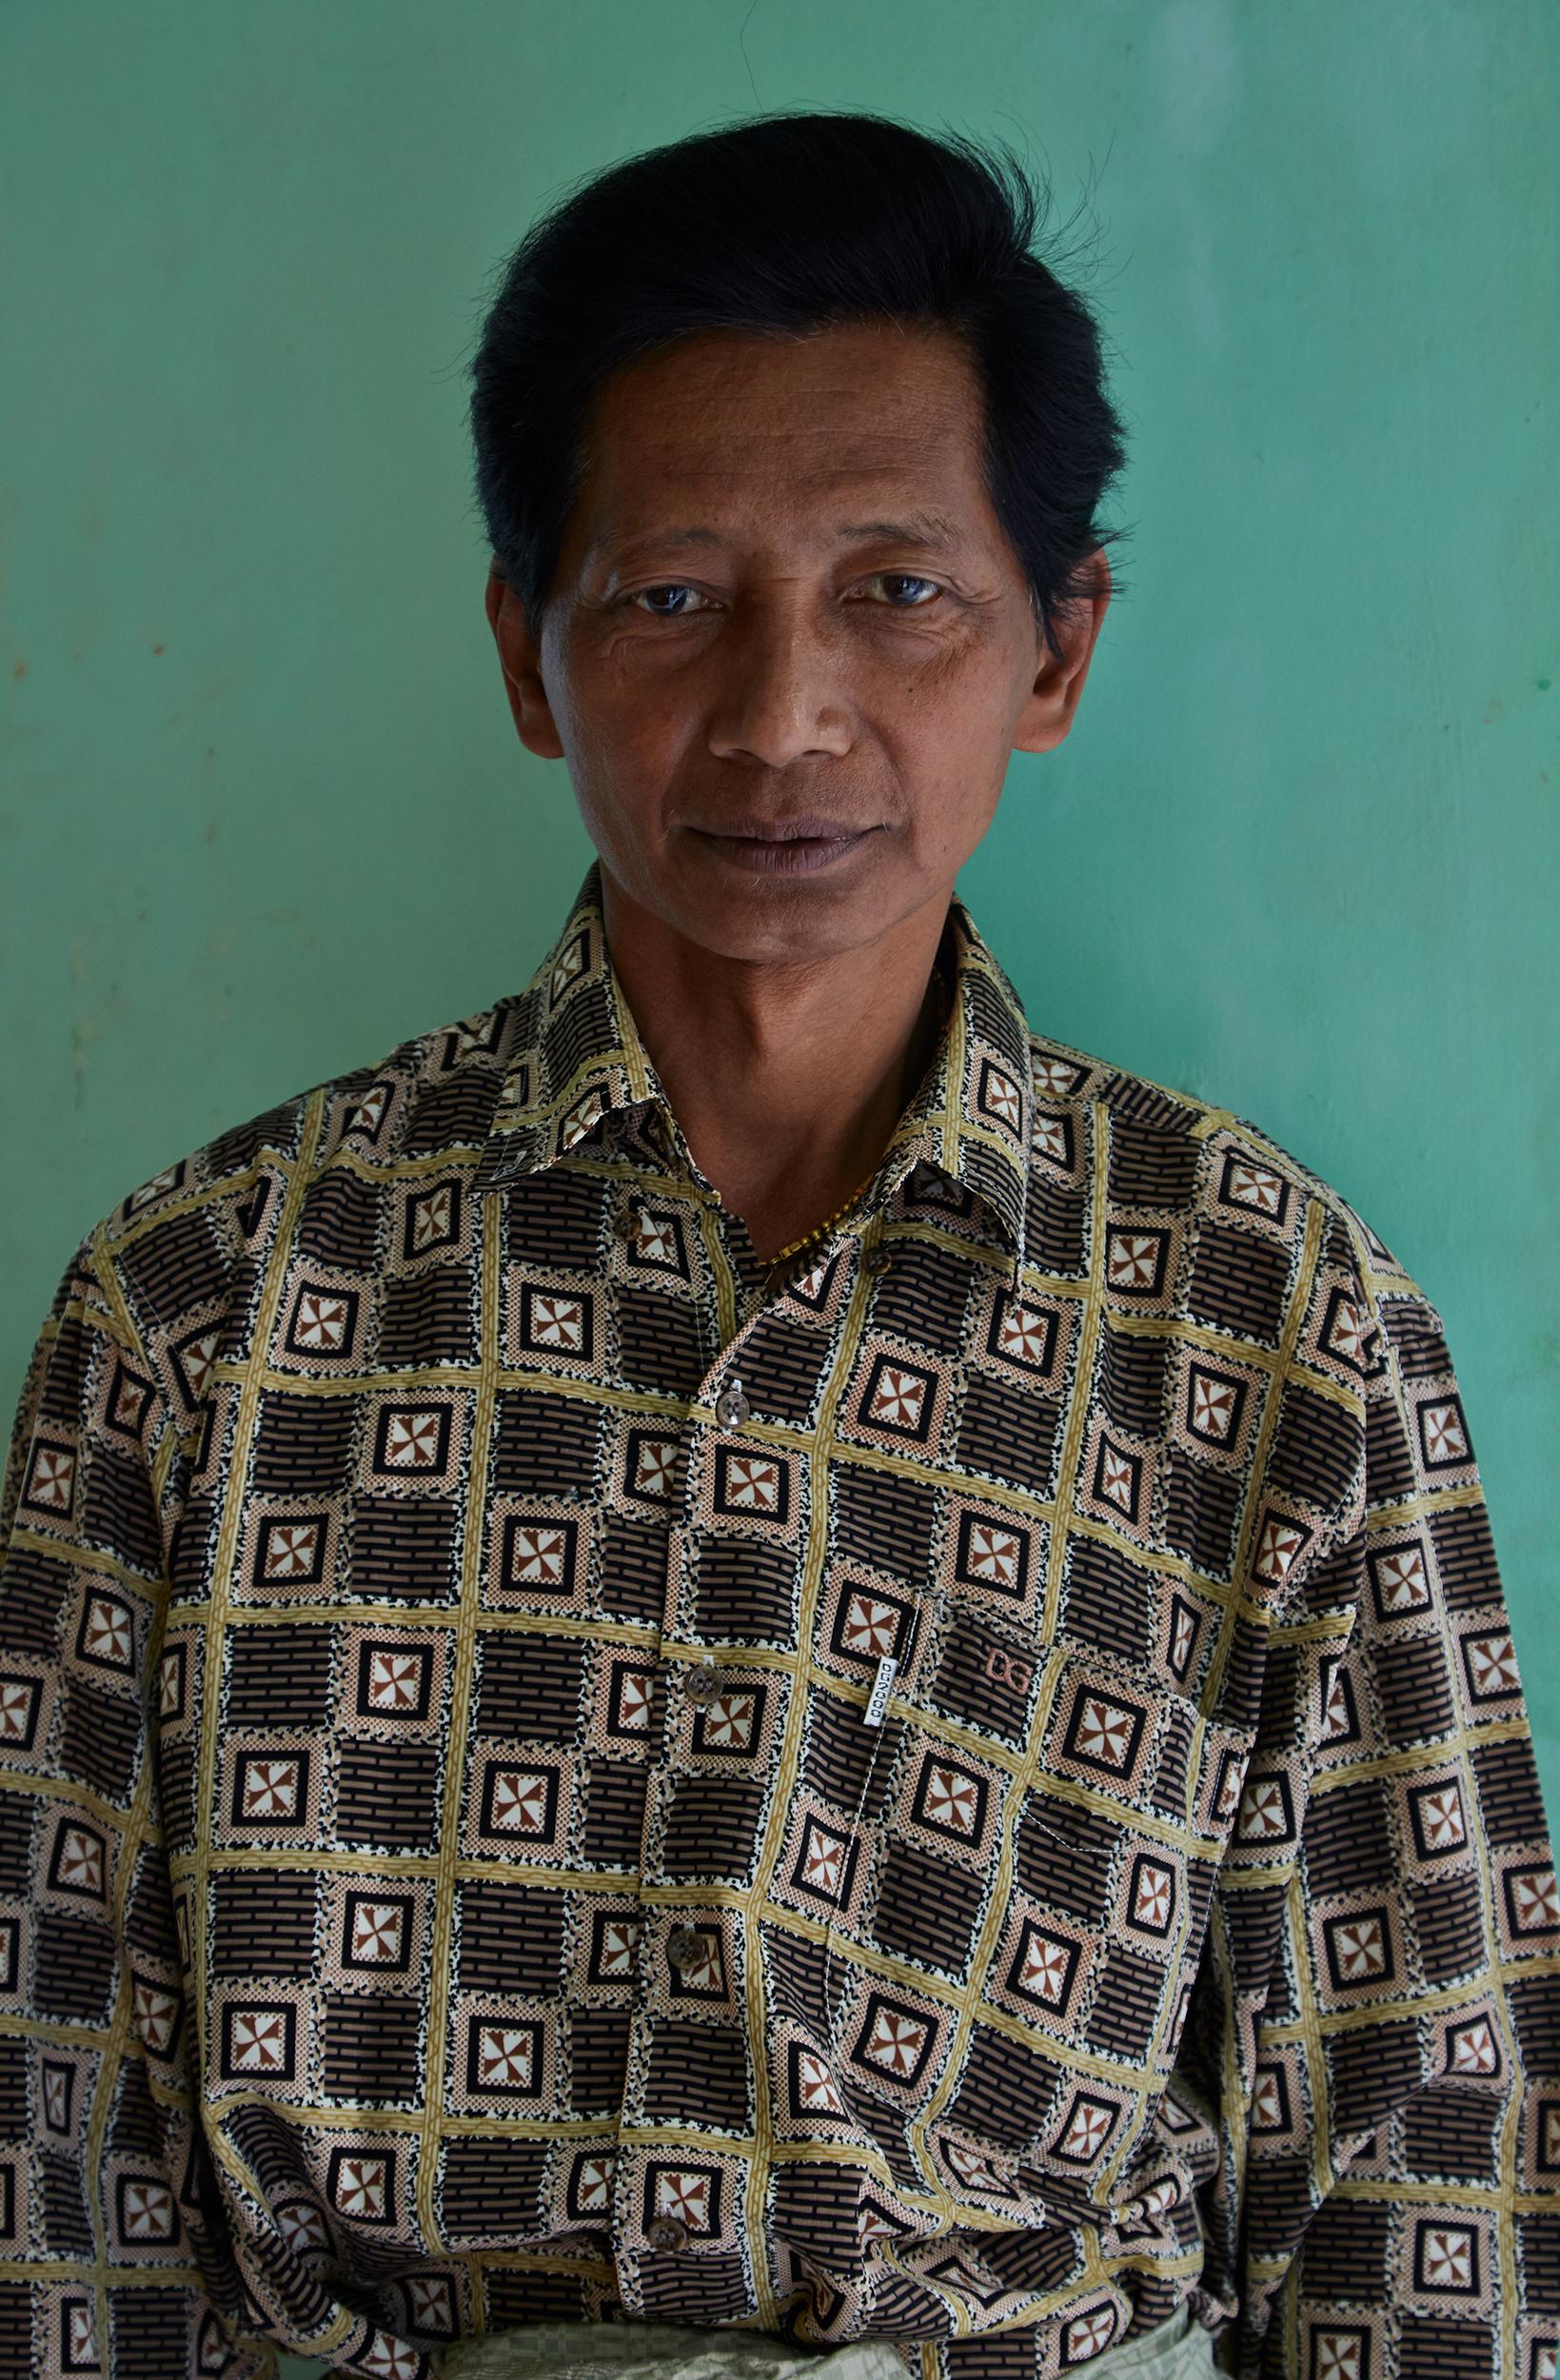 Kanjana-Chaiwatanachai-Image-Works_Yangon_2014.01.12_149w.jpg